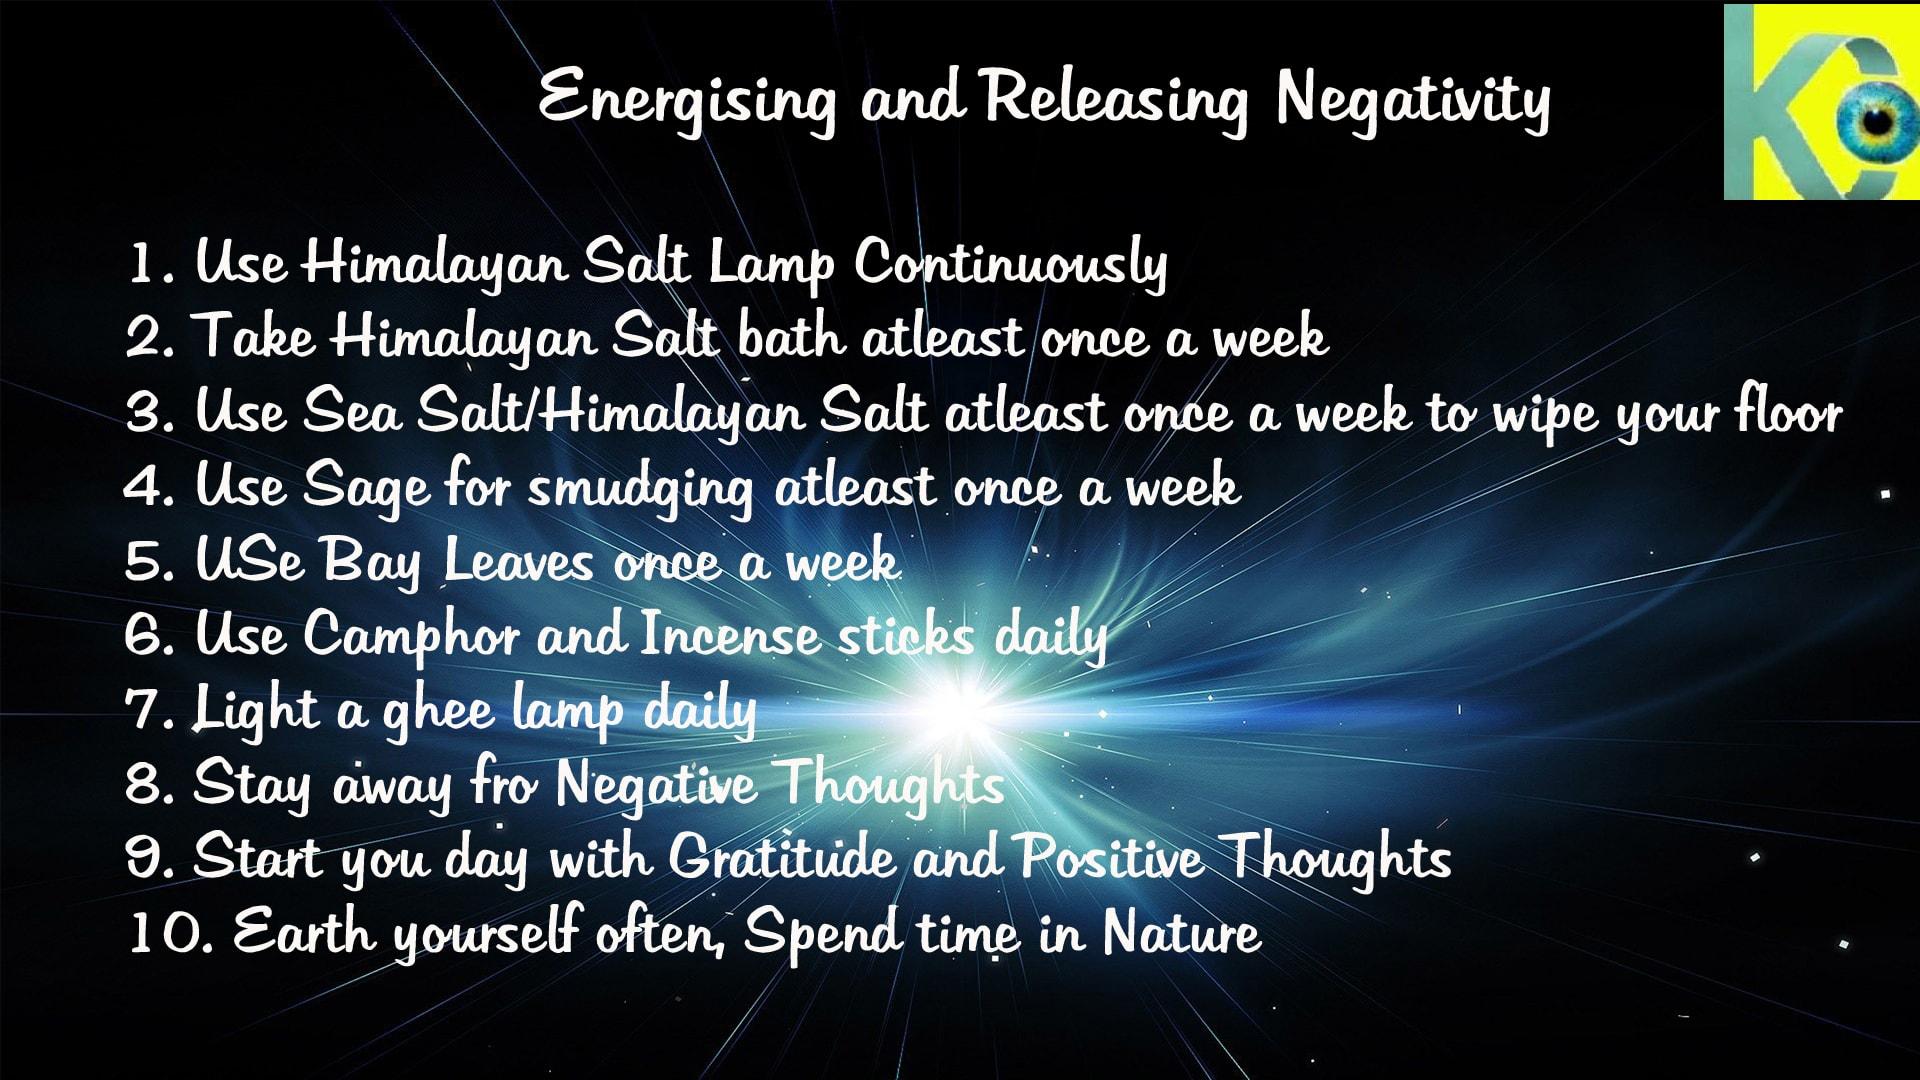 Energising and Releasing Negativity